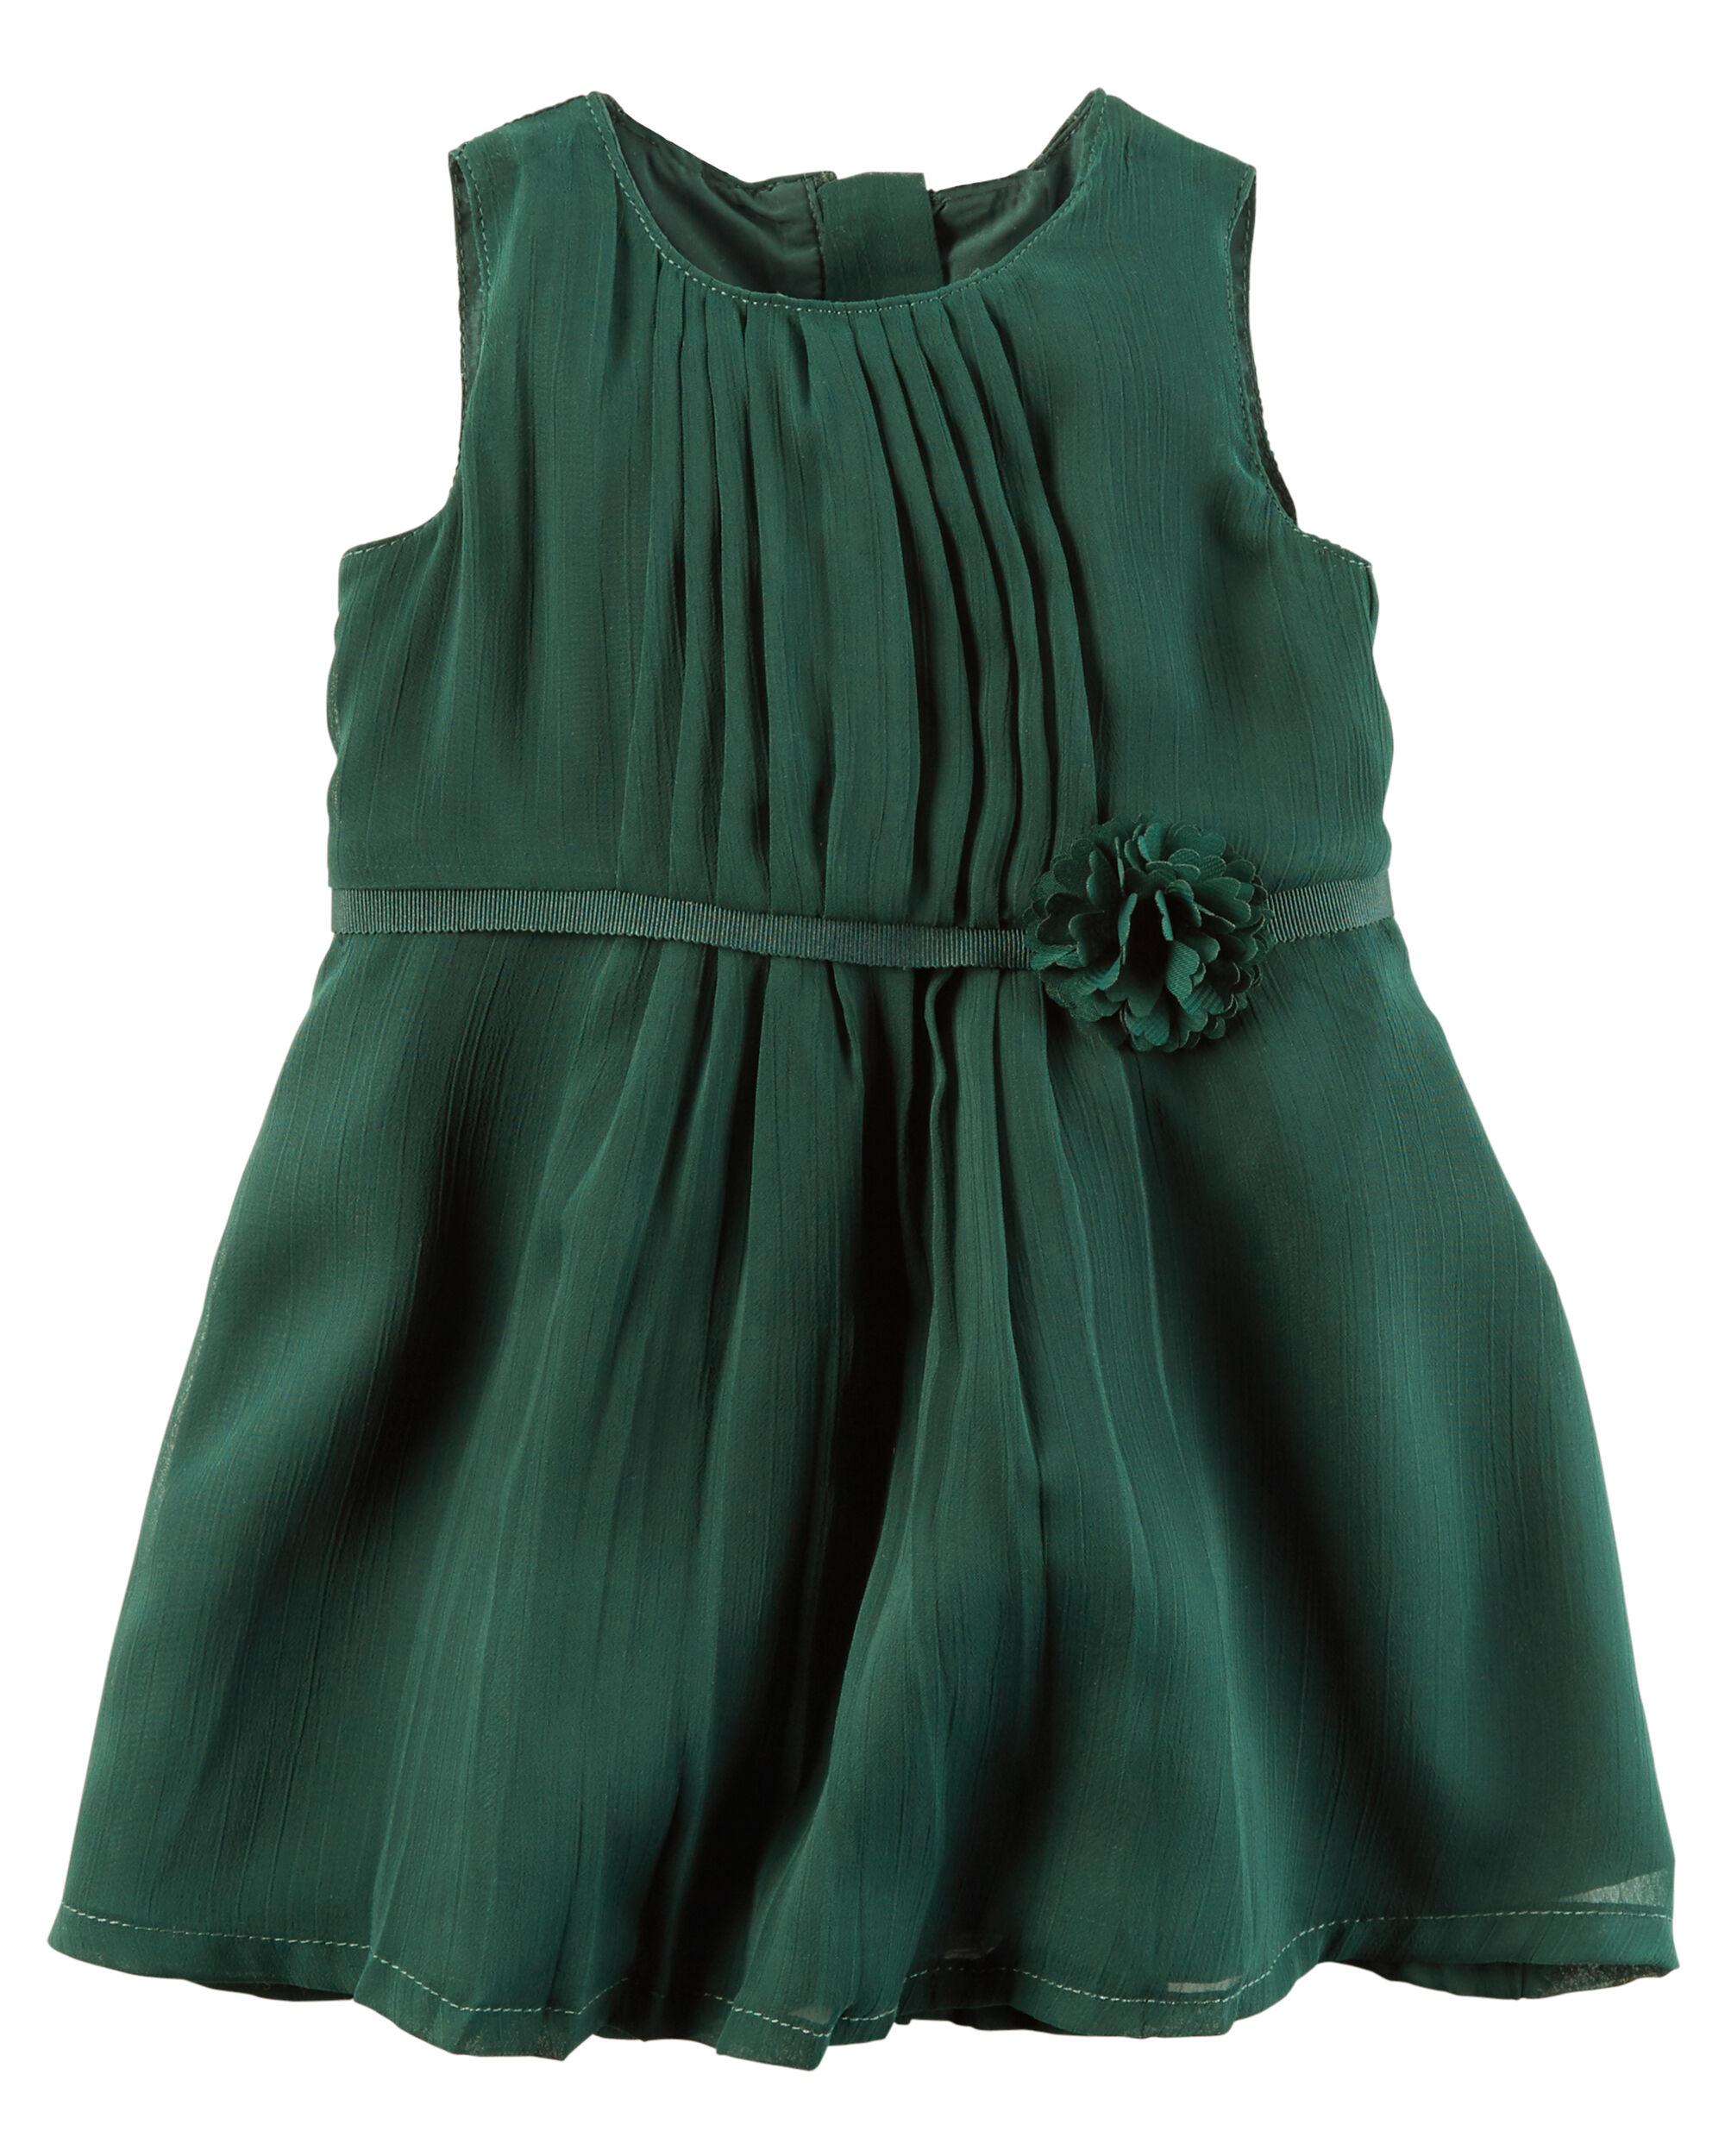 Bow Belt Chiffon Dress ...  sc 1 st  Carteru0027s & Bow Belt Chiffon Dress | Carters.com